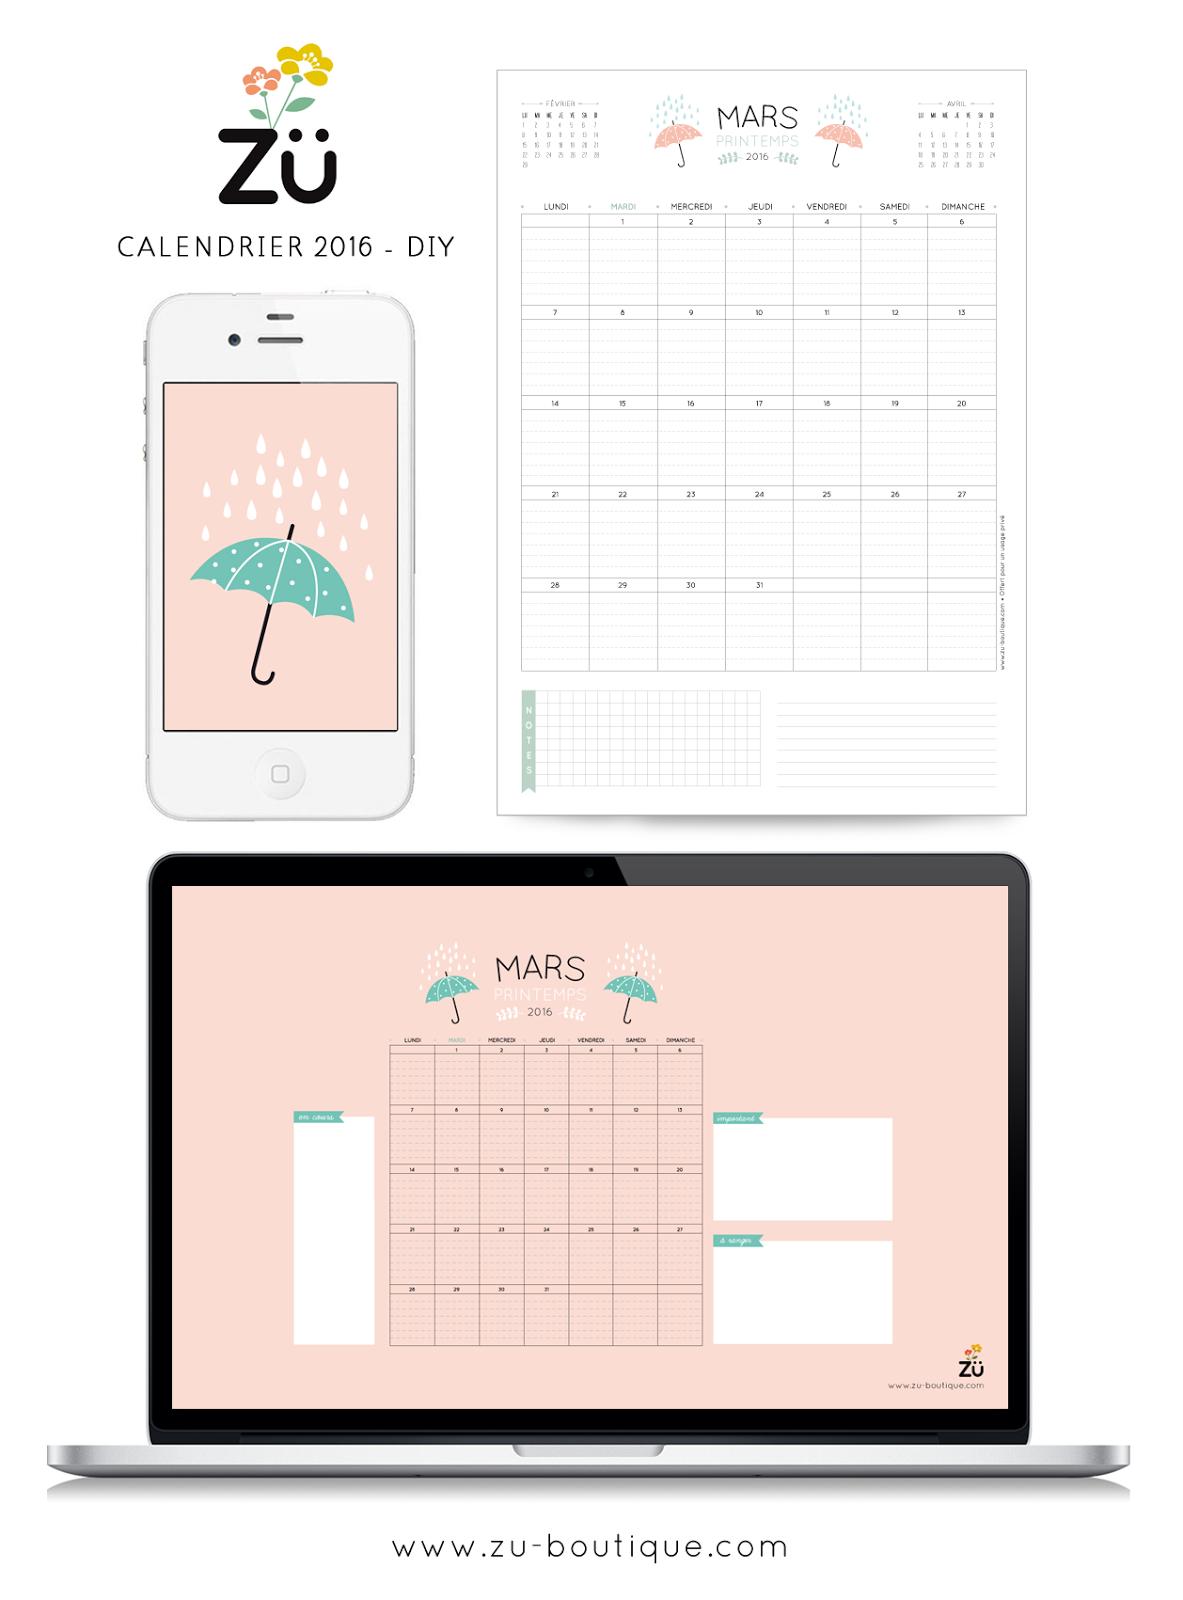 Z le calendrier diy mars 2016 for Calendrier jardin mars 2016